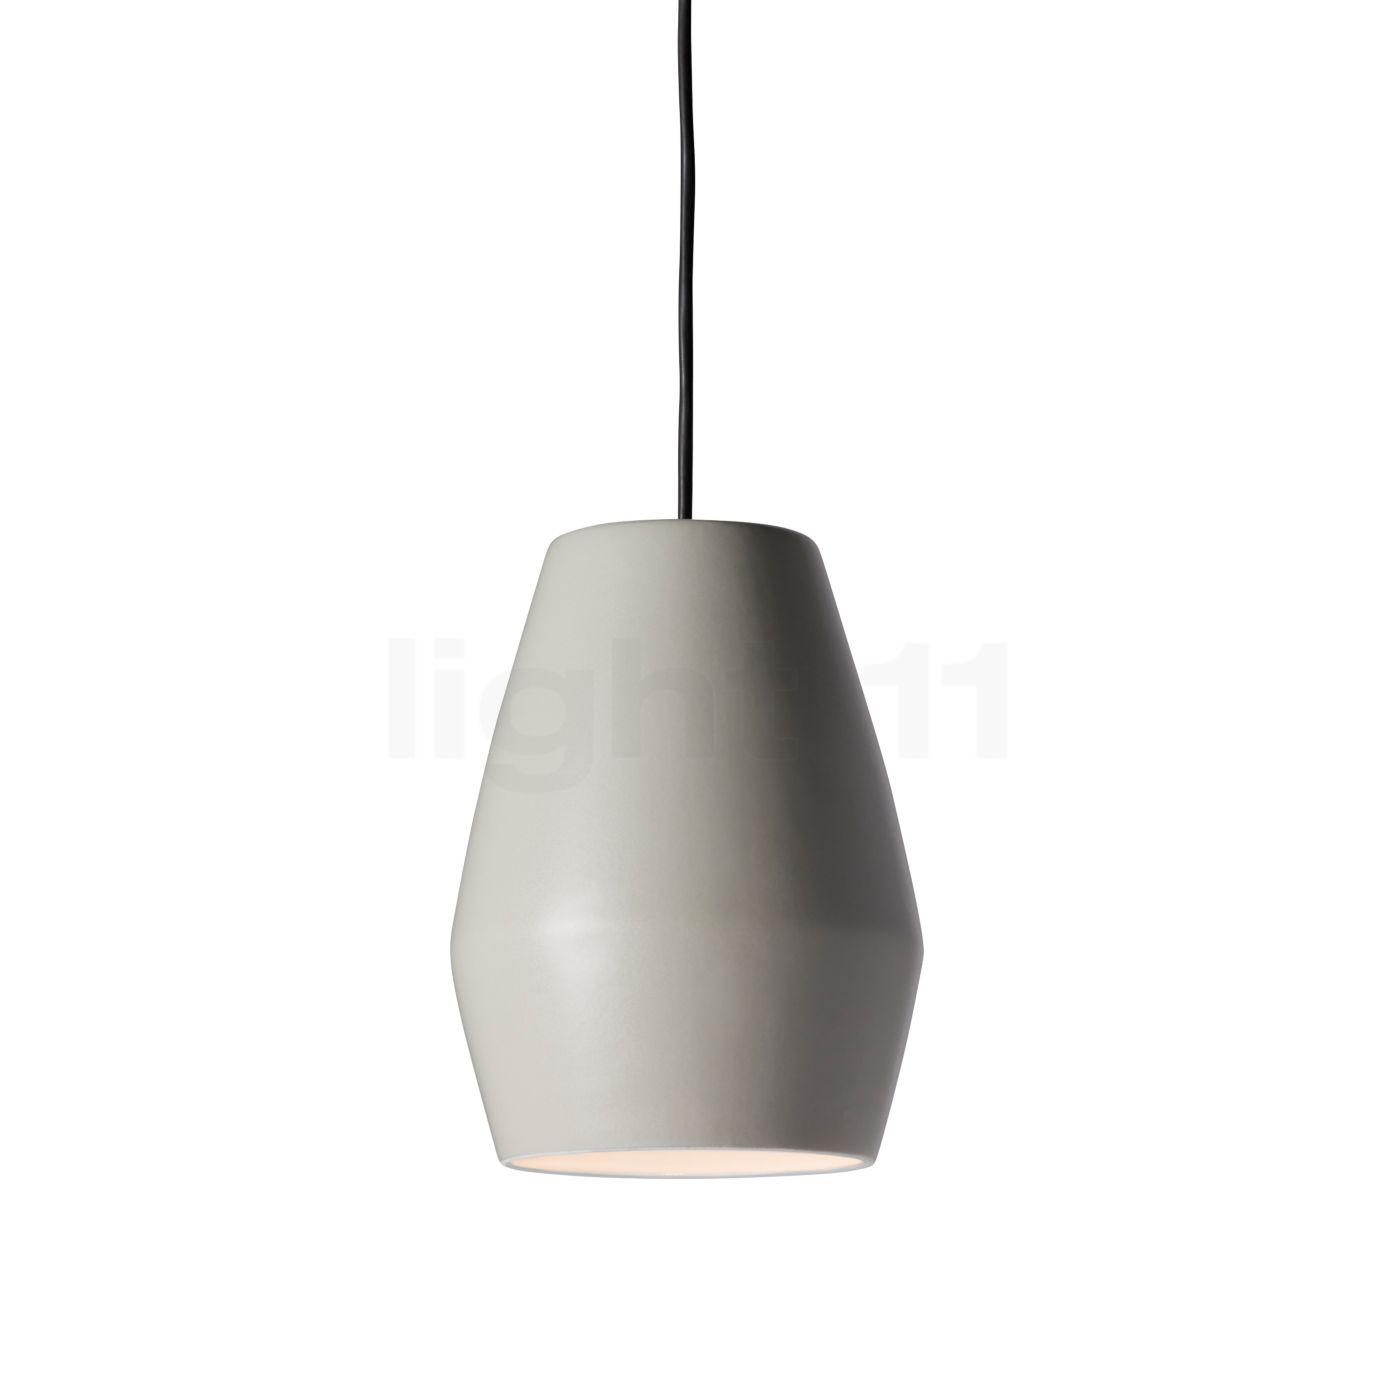 Buy northern bell pendant light at light11 aloadofball Gallery